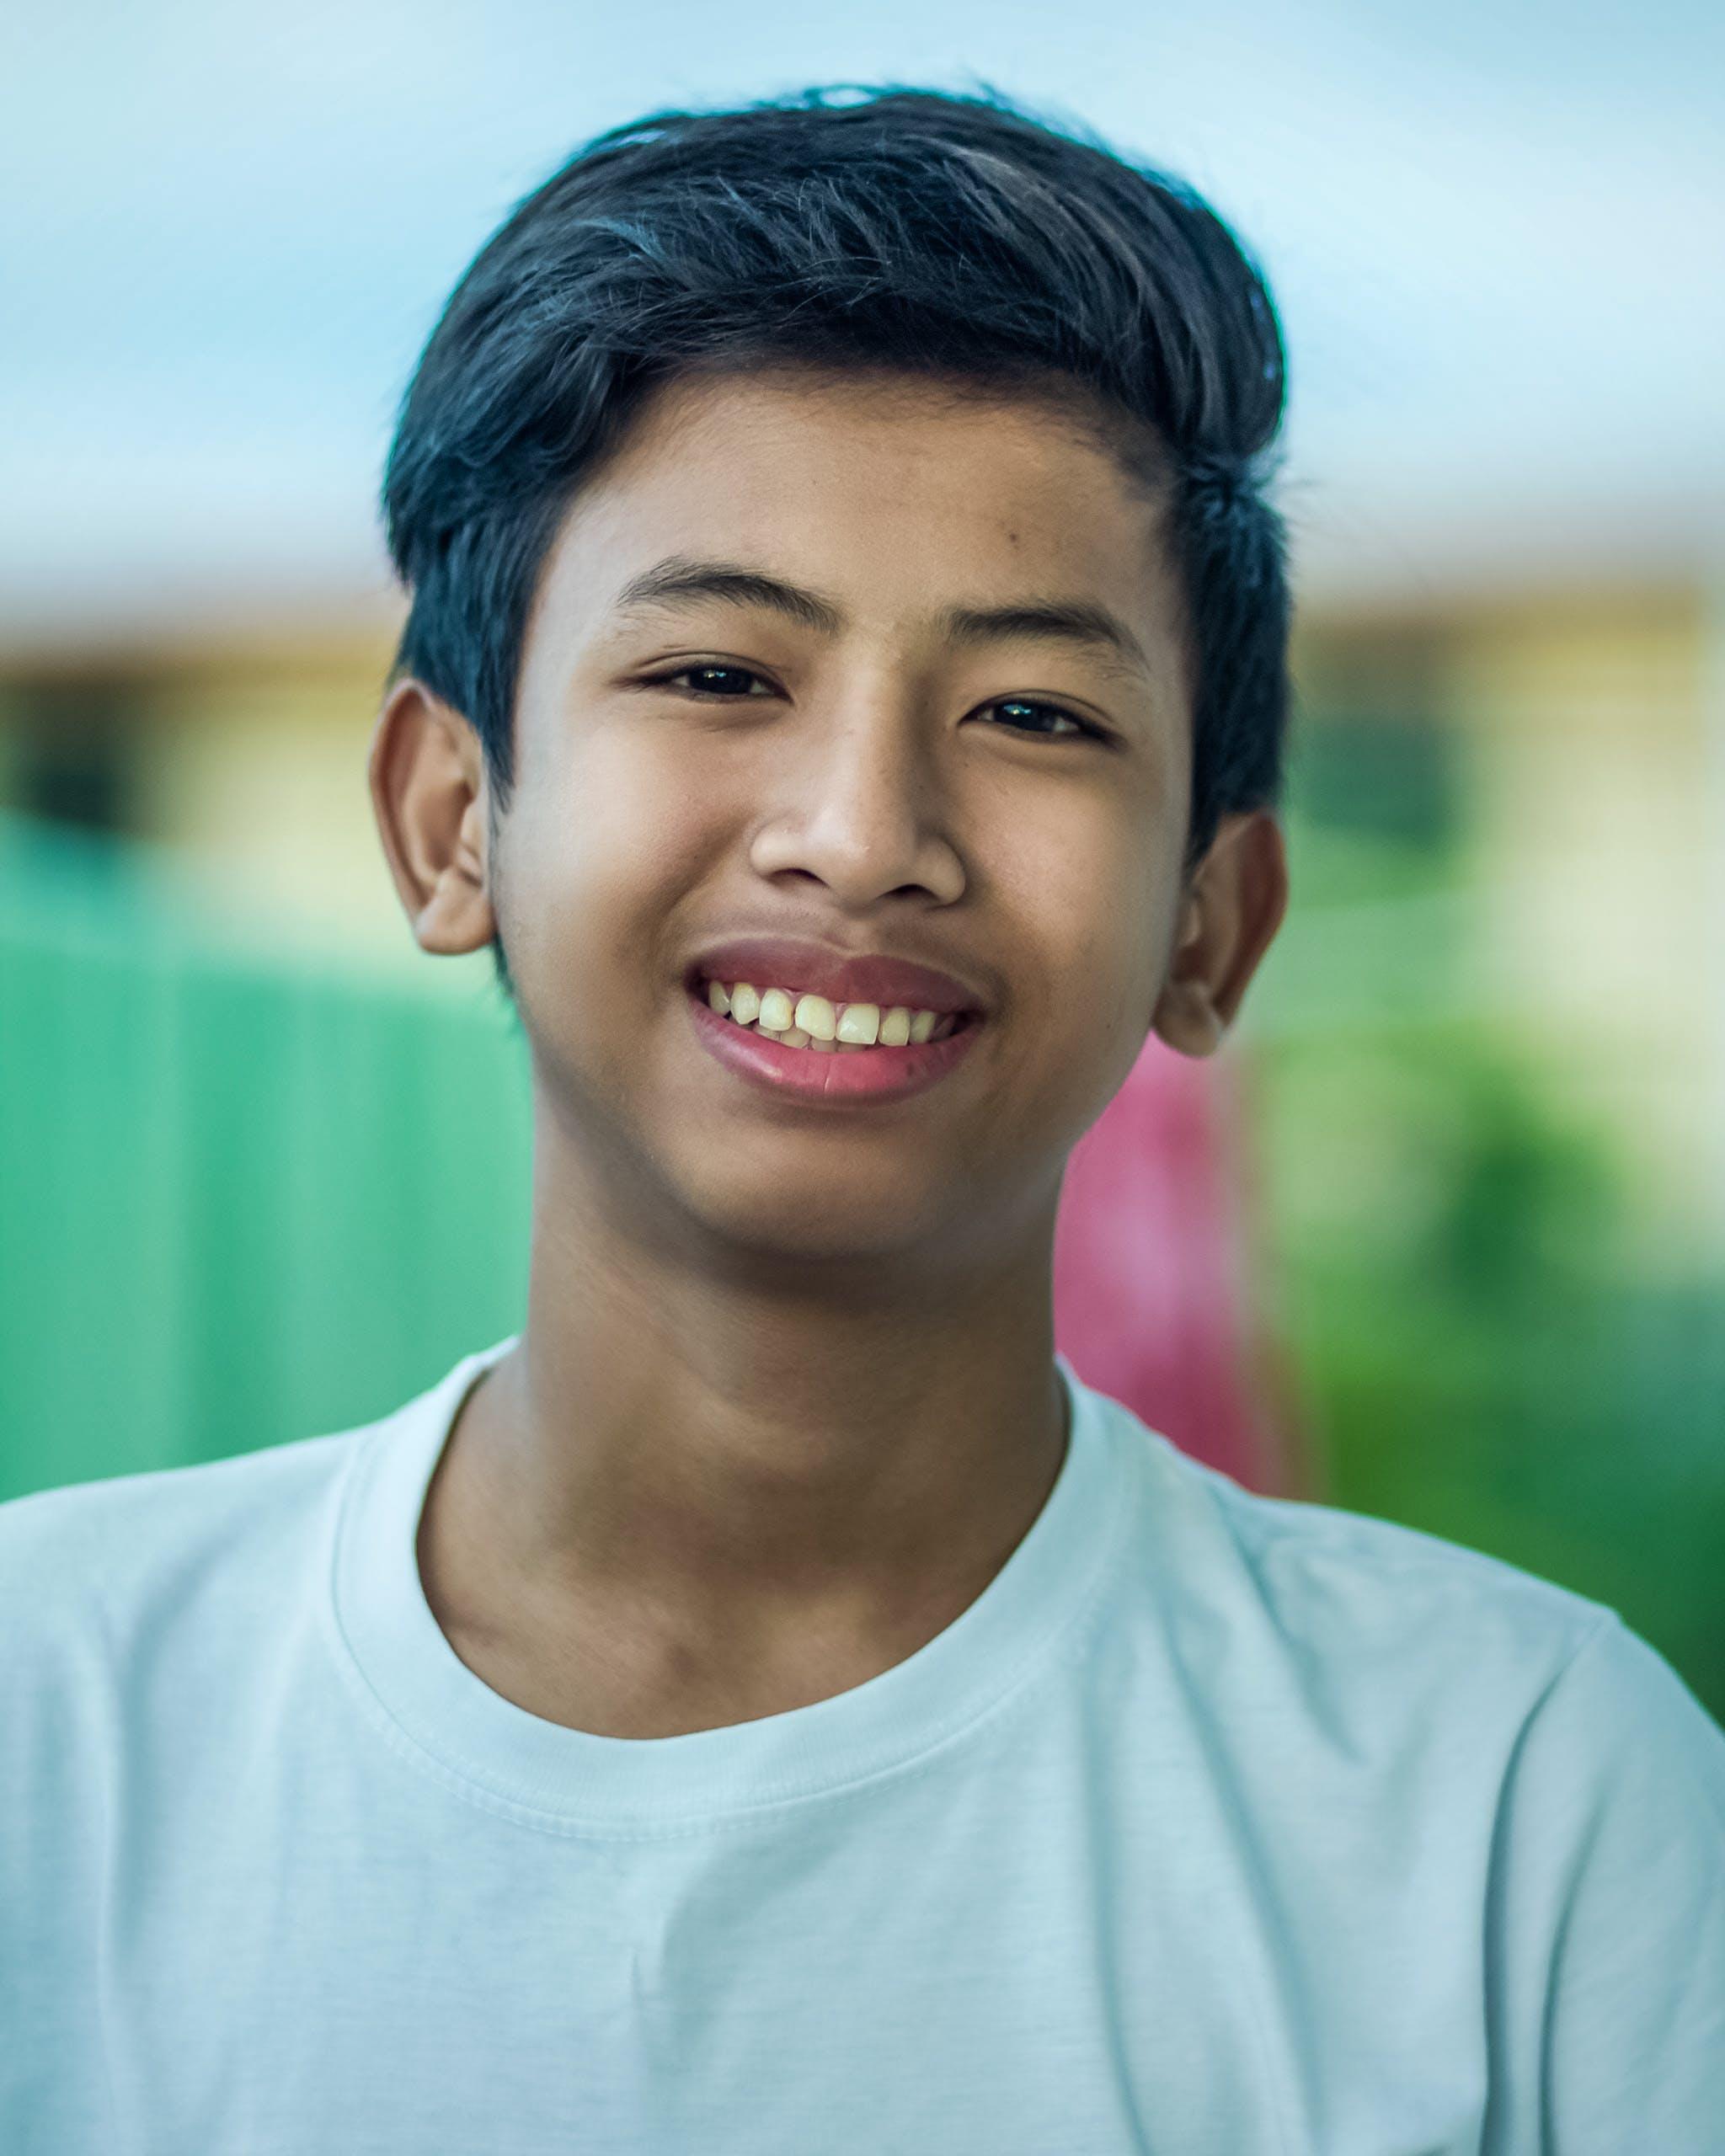 Free stock photo of asian boy